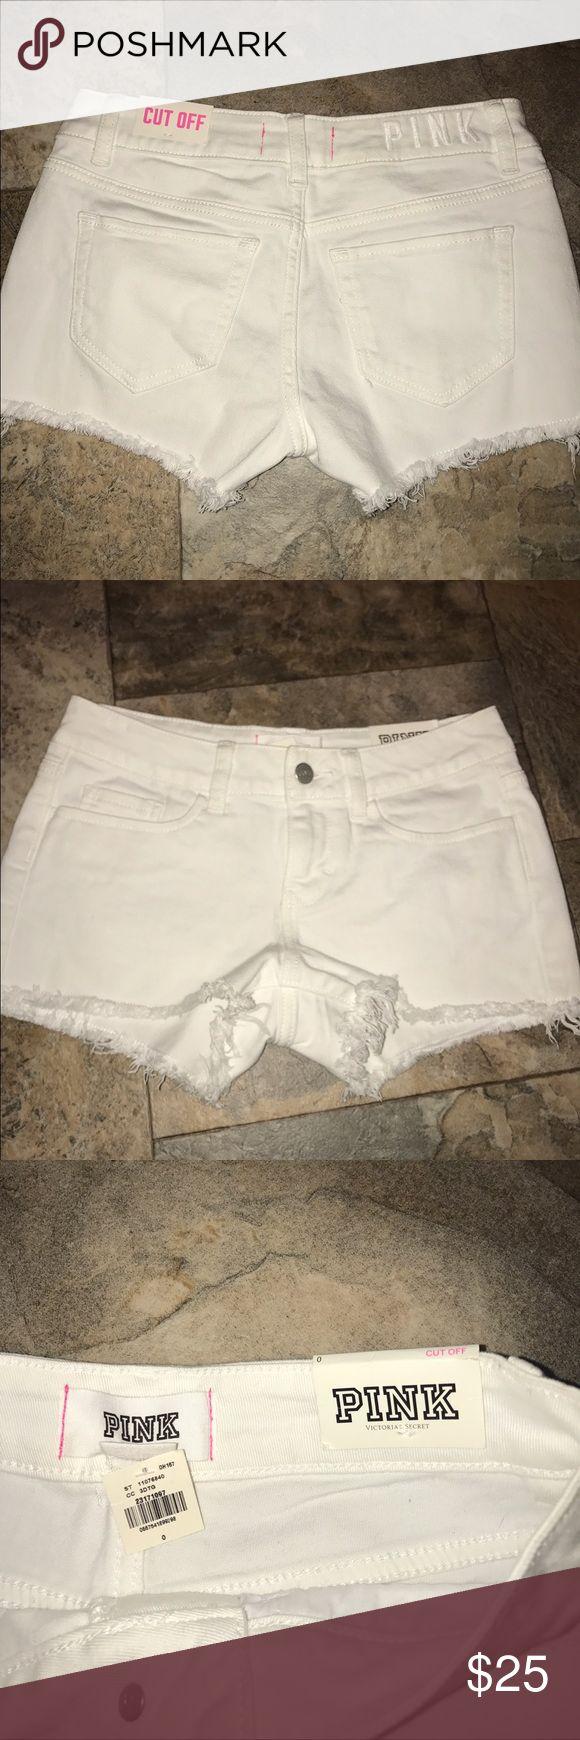 Victoria Secret pink white jean shorts NWT size 0 New with tags Victoria Secret pink white cut off jean shorts size 0. PINK Victoria's Secret Shorts Jean Shorts